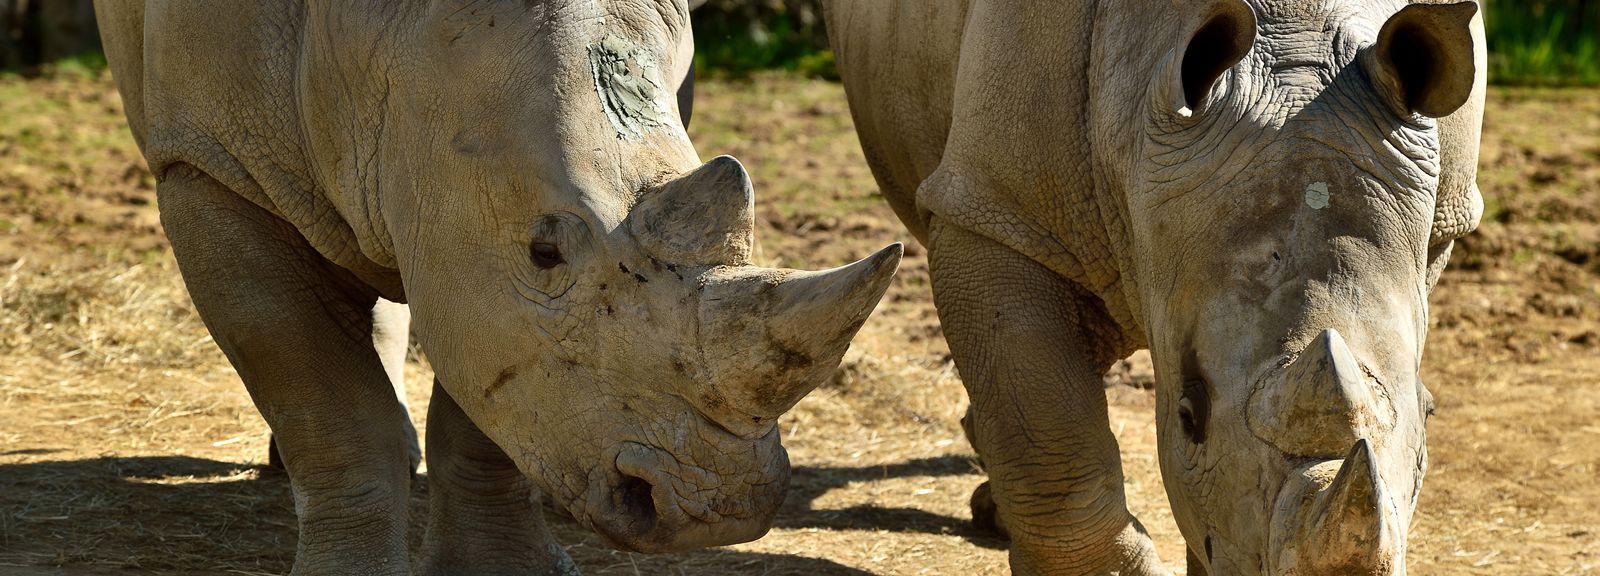 Rhinocéros blancs © MNHN - F-G Grandin